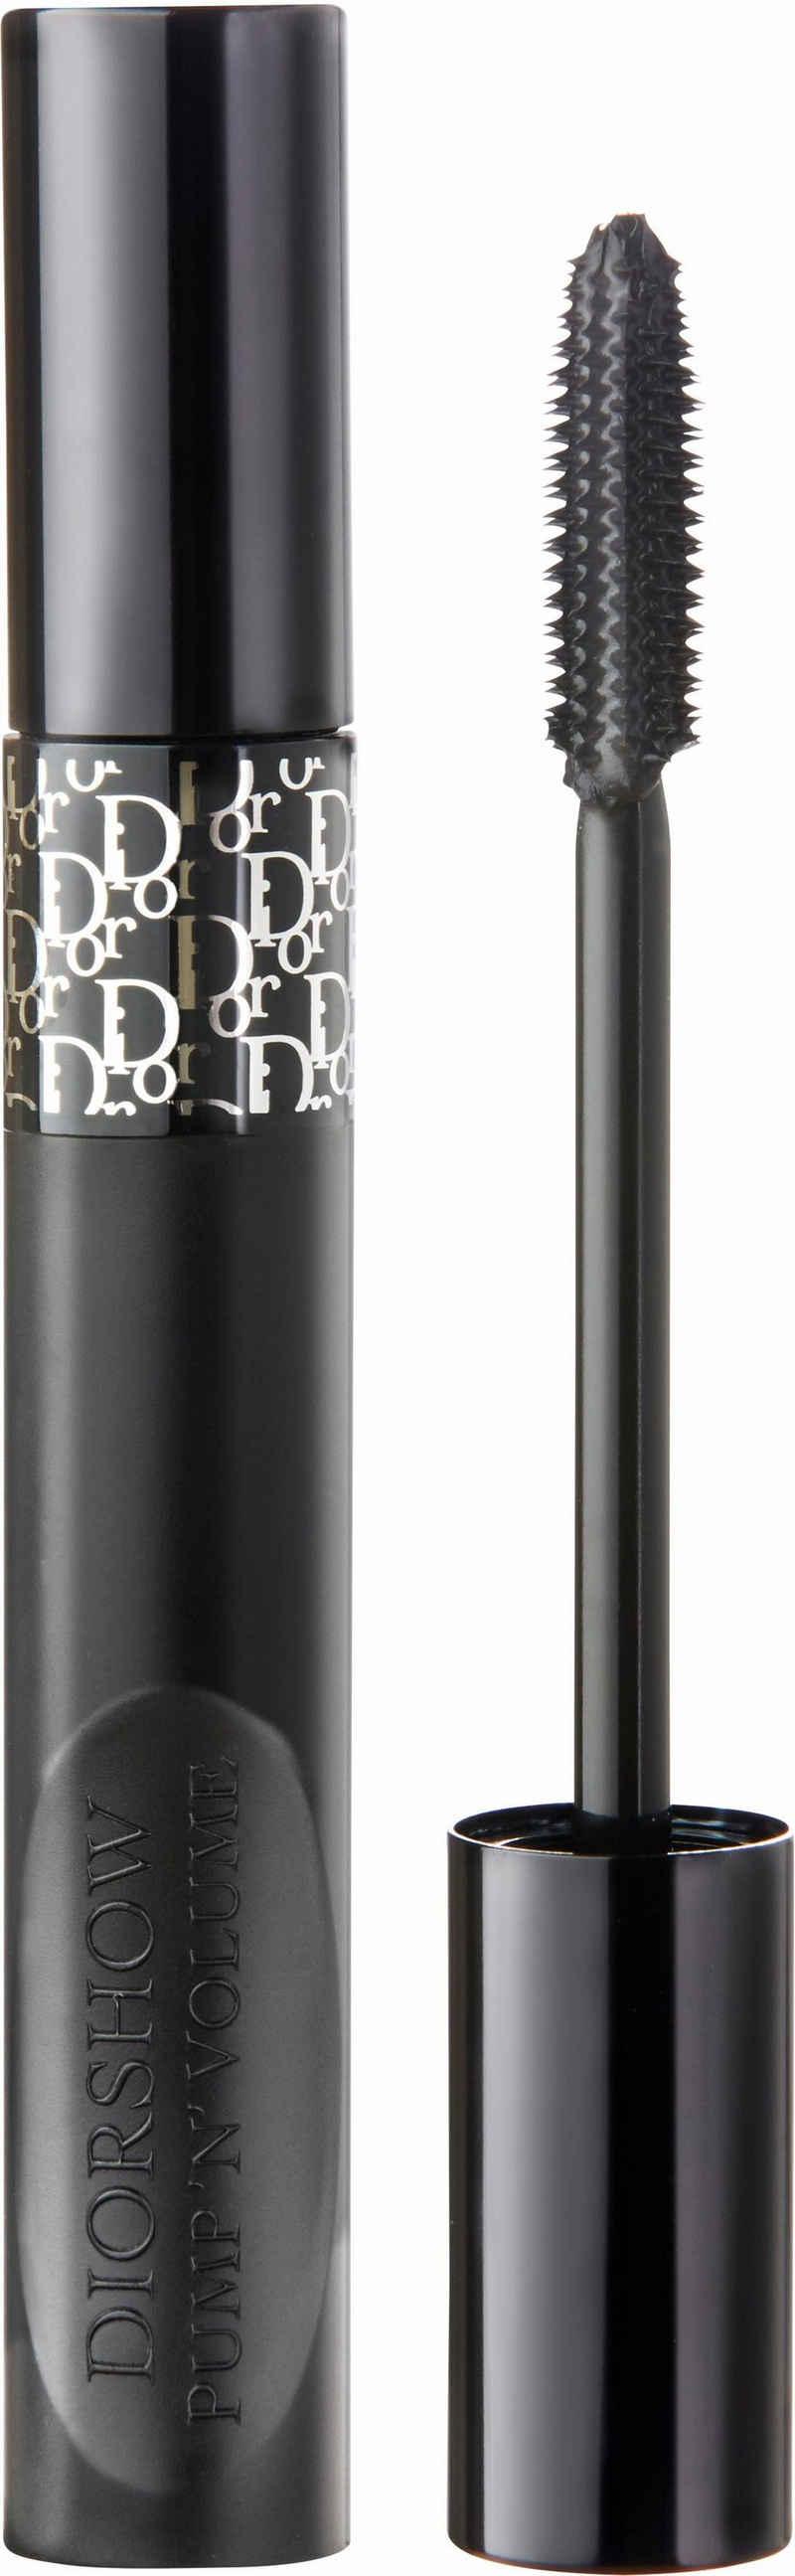 Dior Mascara »Diorshow Pump'N'Volume«, Elastischer Flakon